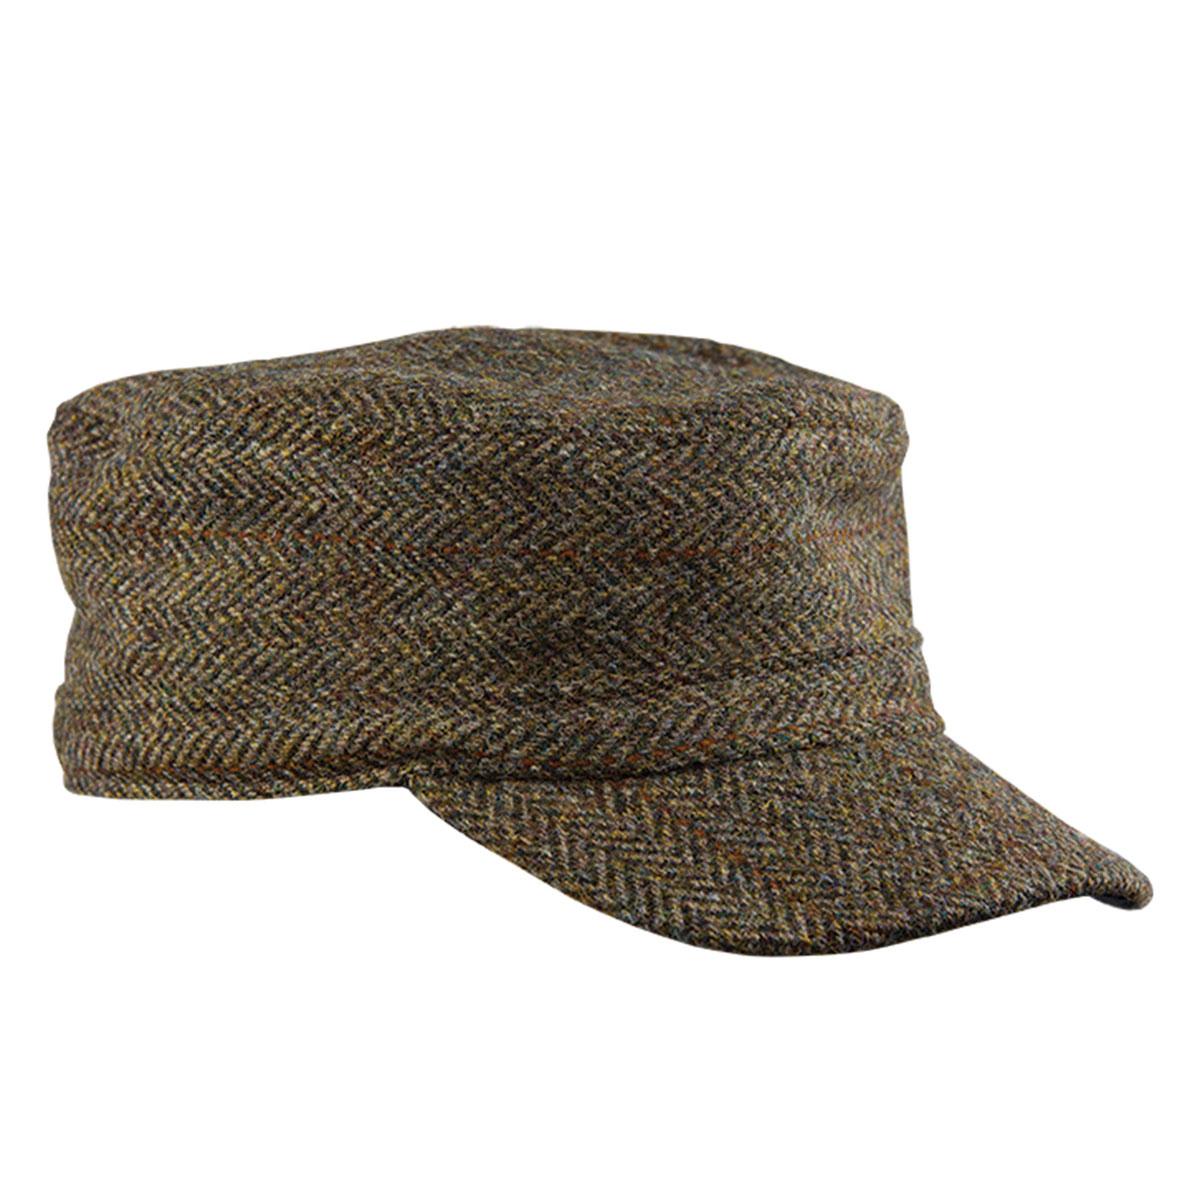 1960s -1970s Men's Clothing Harris Tweed Flat Top Cap $59.99 AT vintagedancer.com